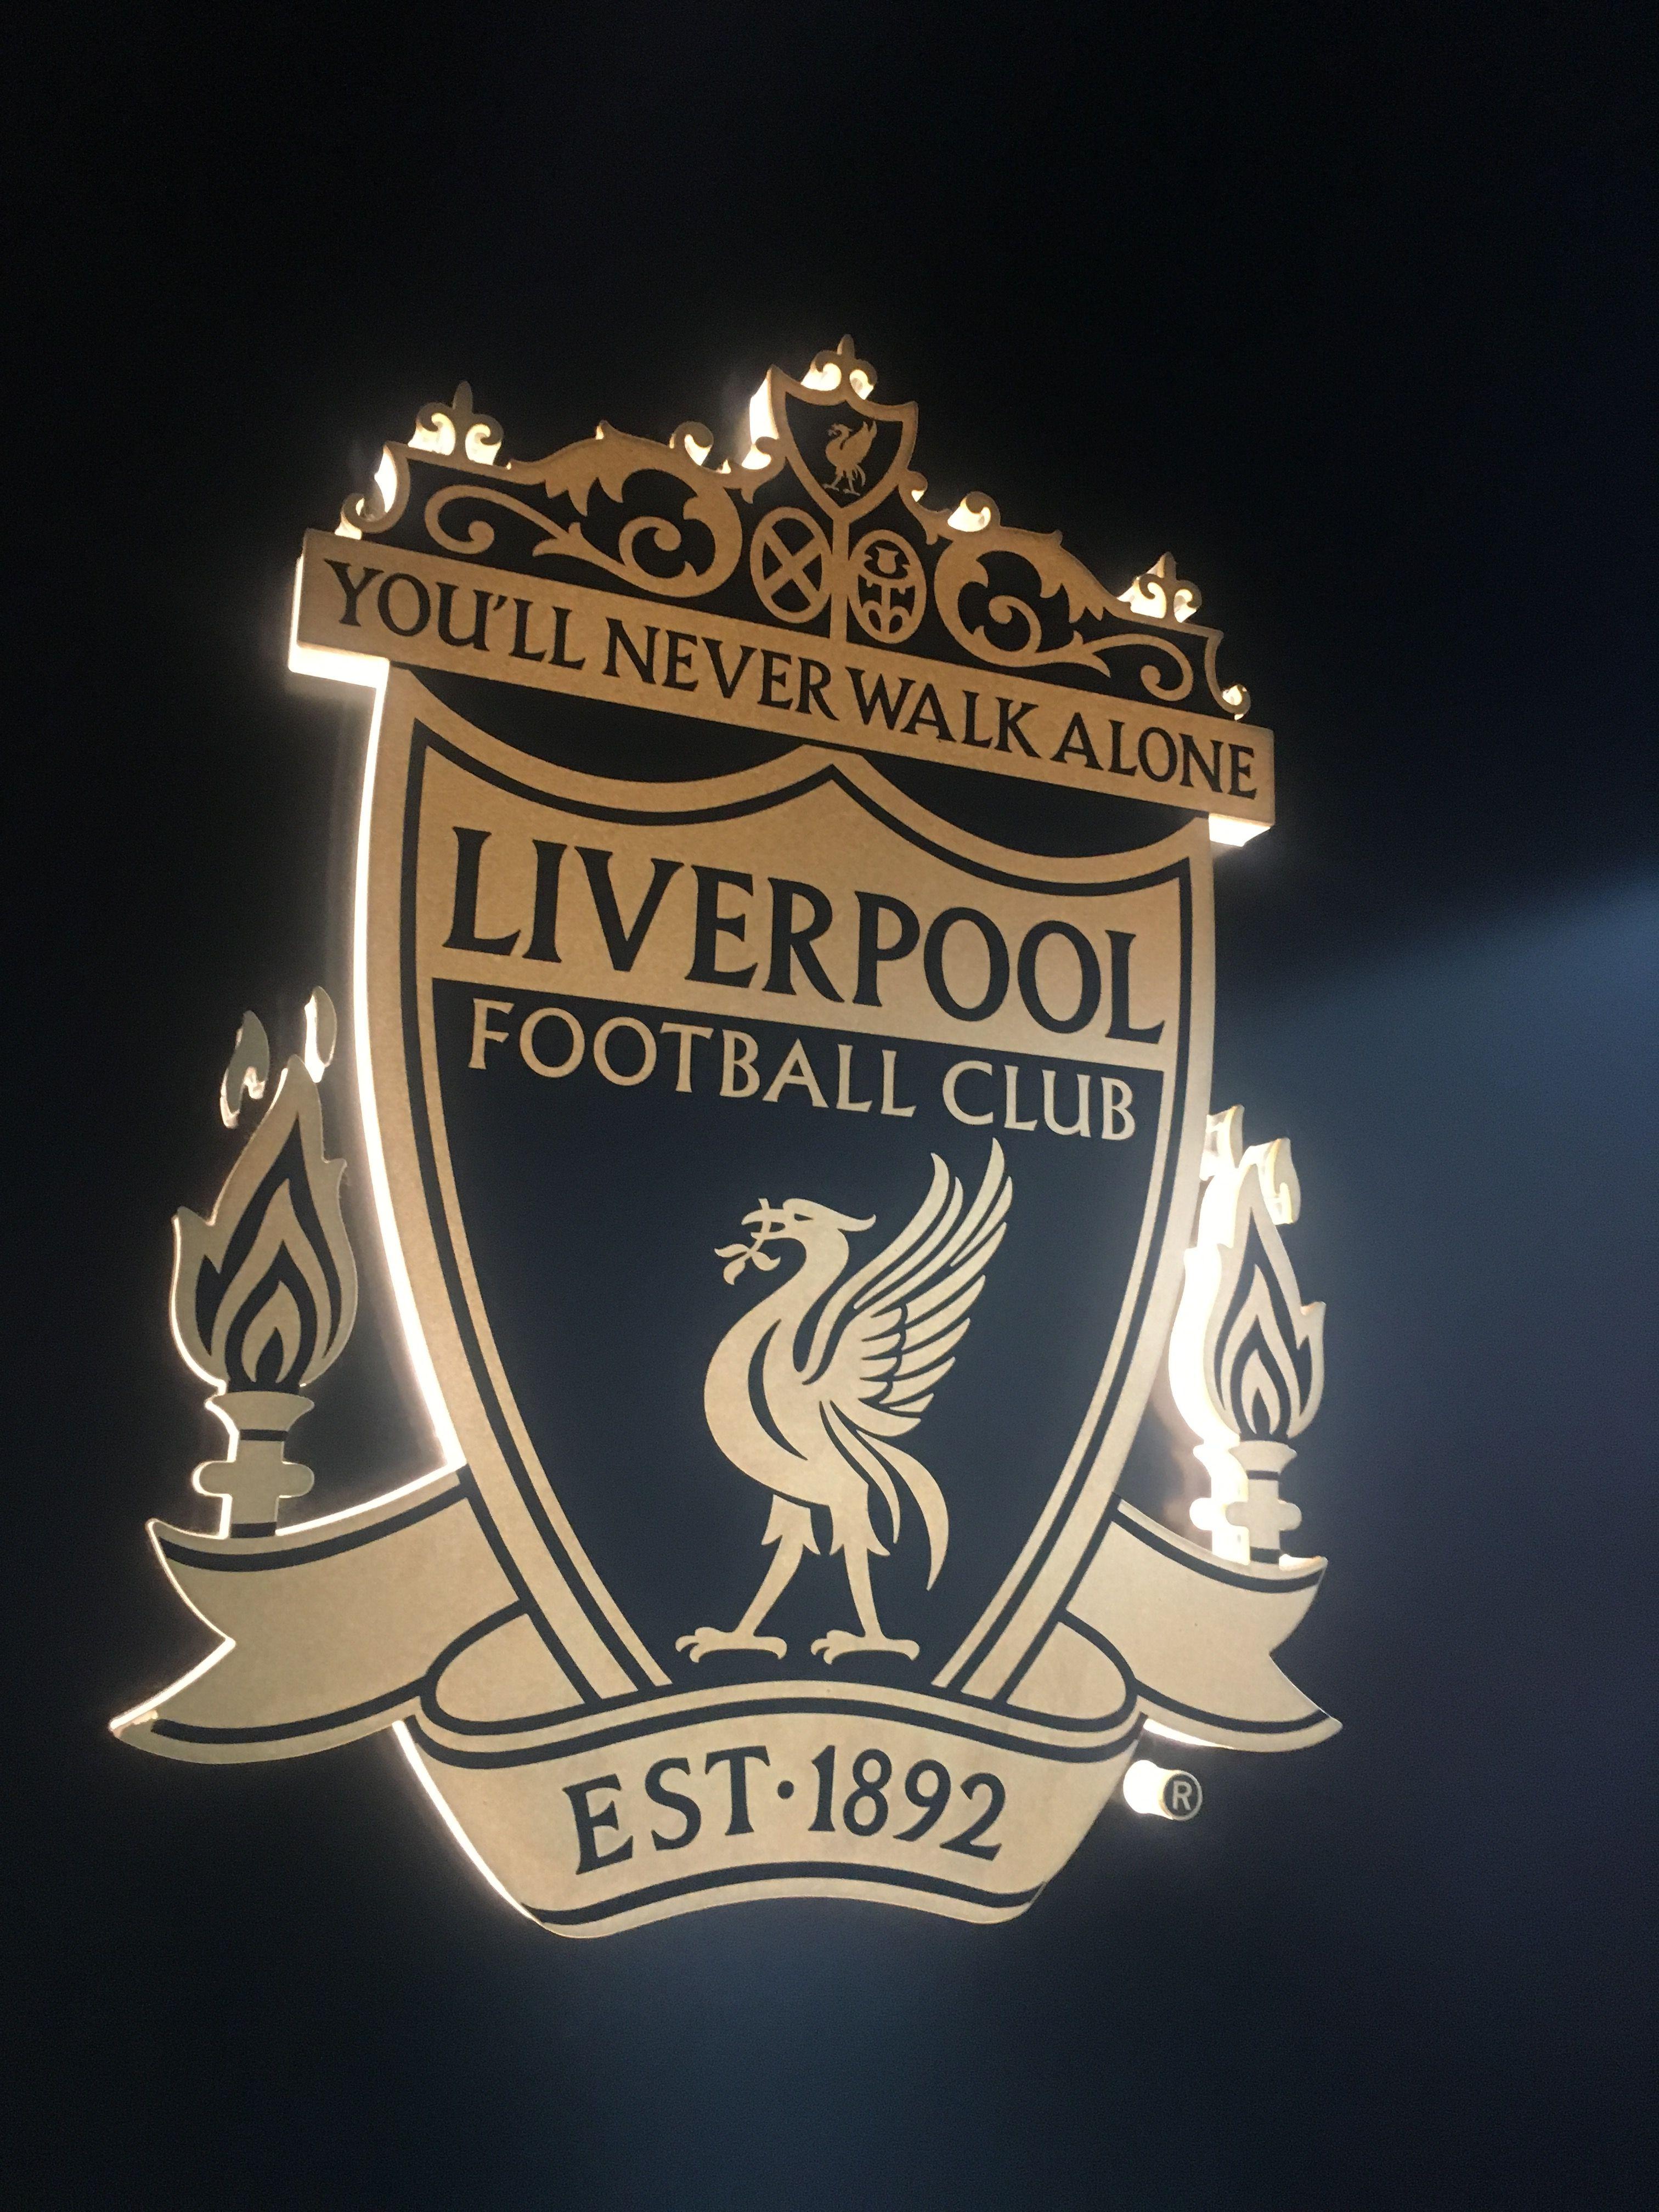 Liverpool Fc Club Badge YNWA Liverpool FC Pinterest